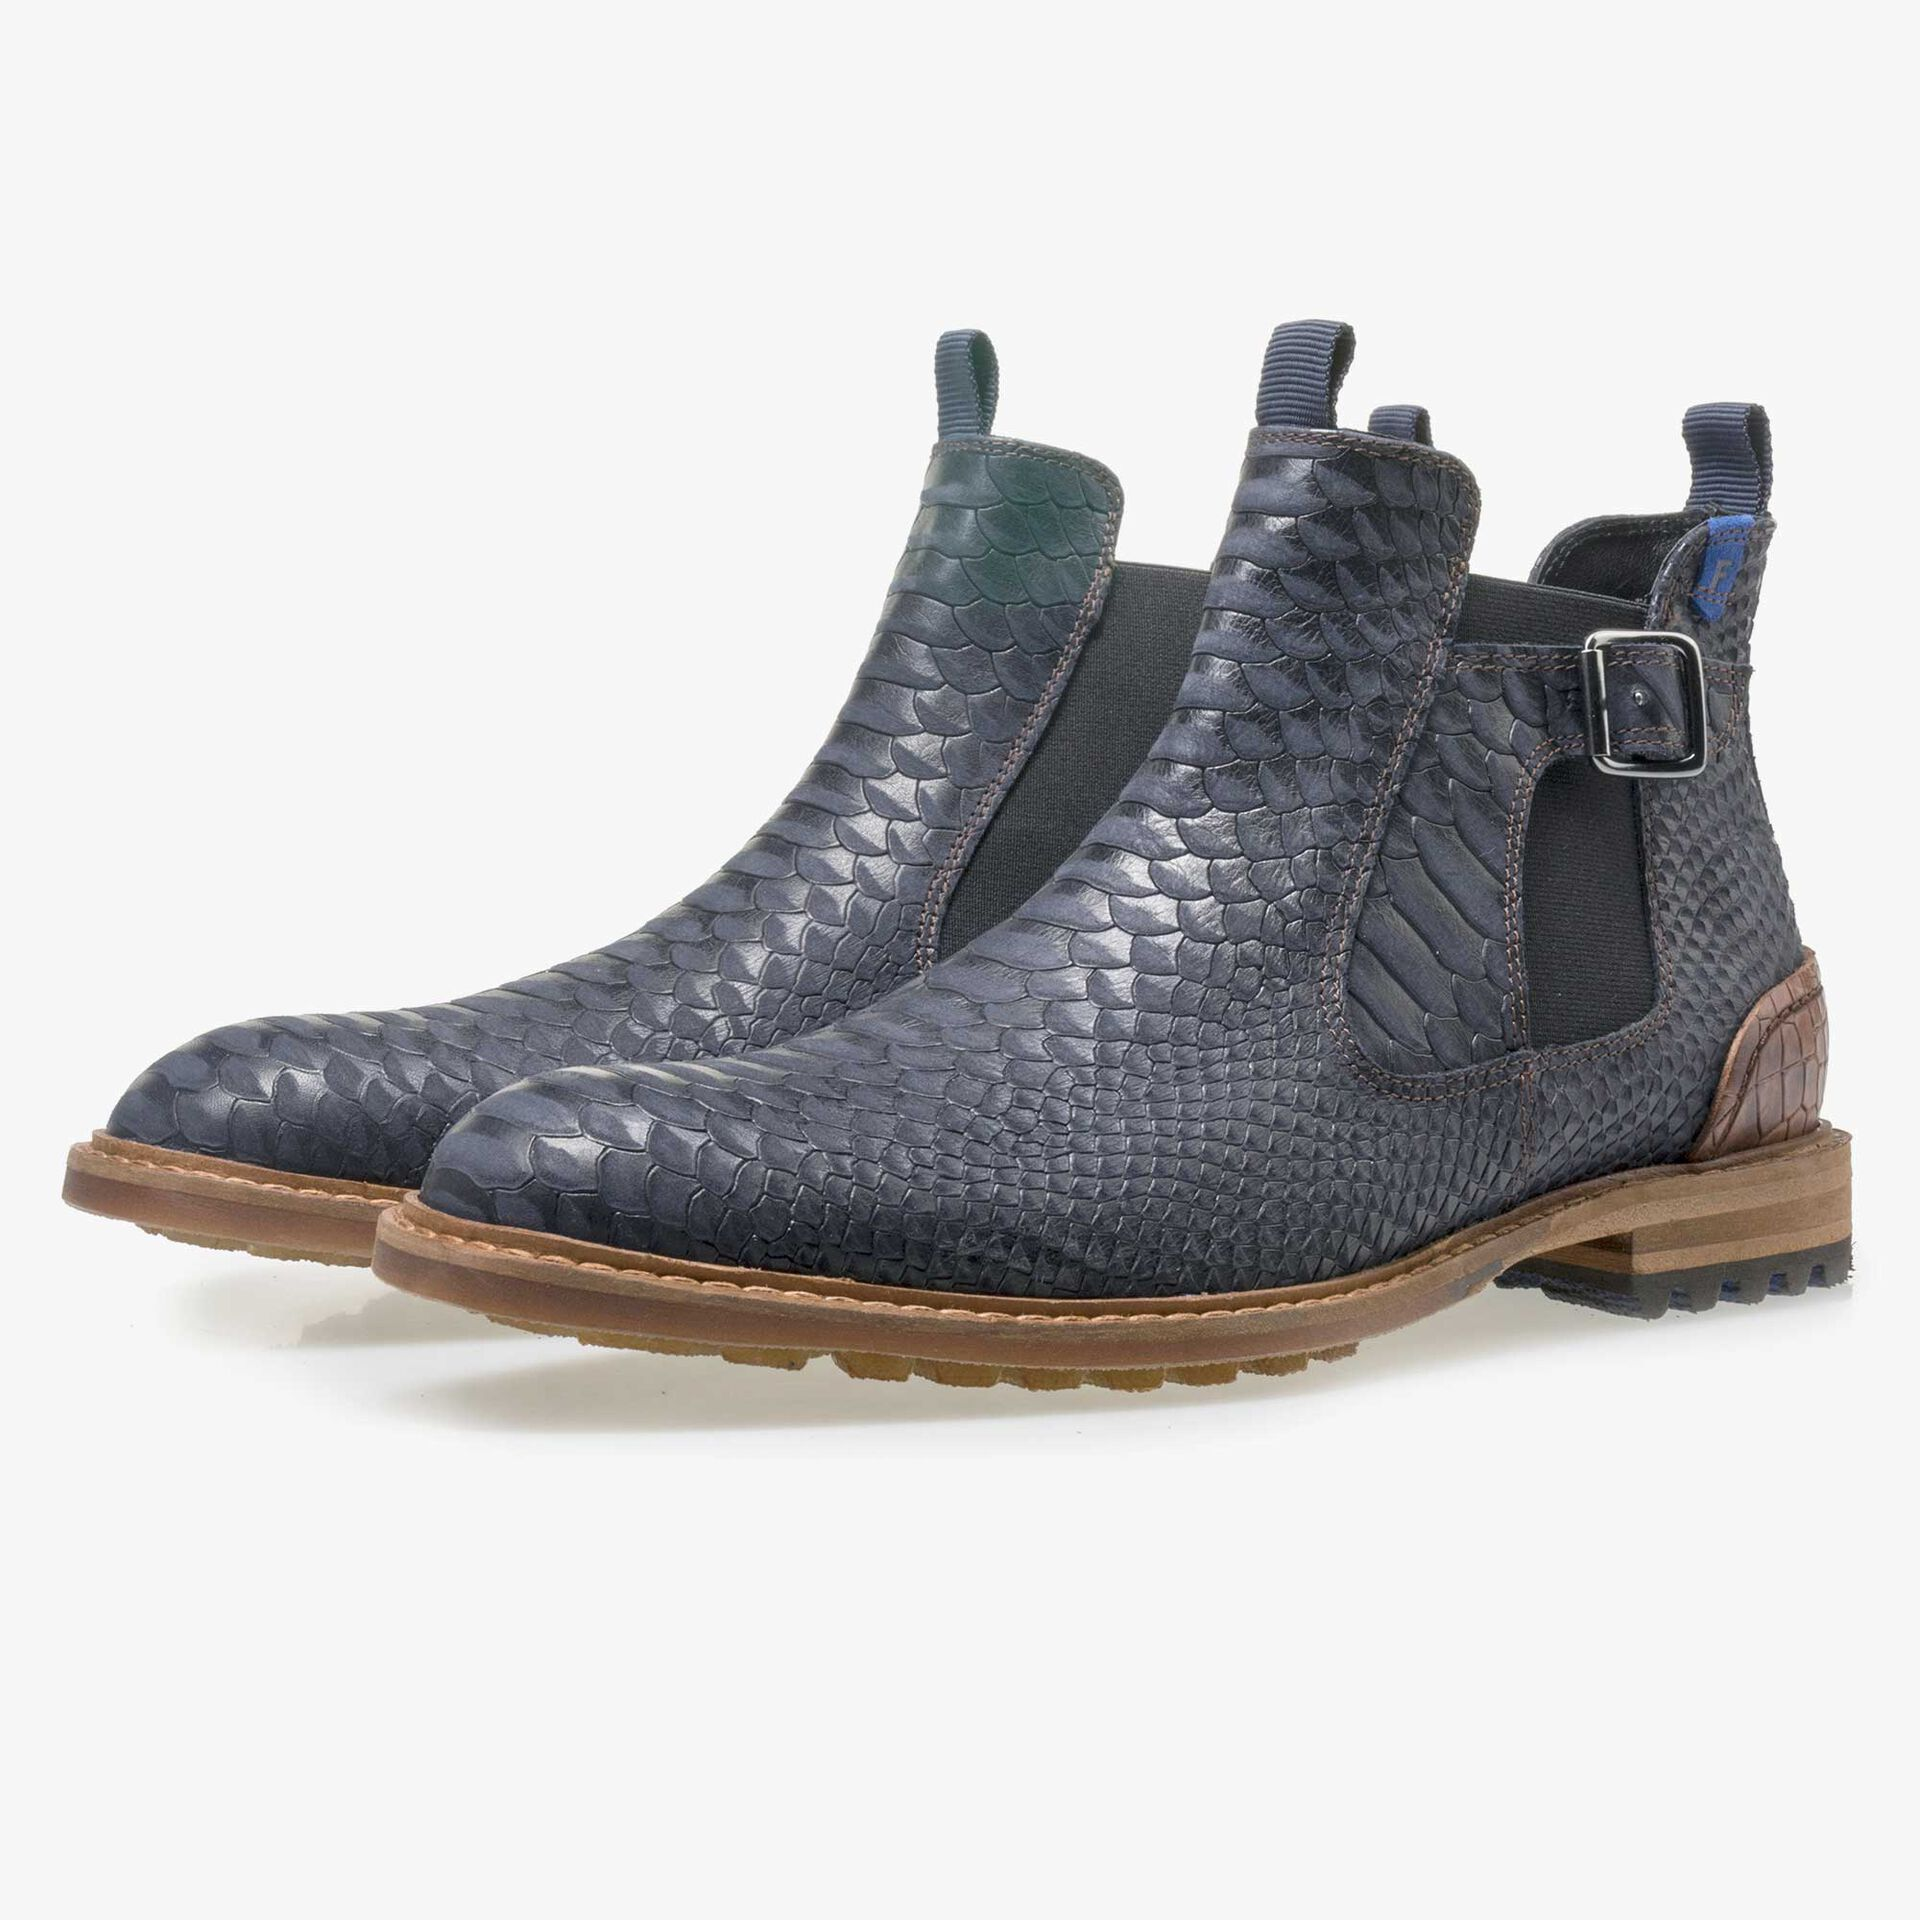 Floris van Bommel men's dark blue leather Chelsea boot